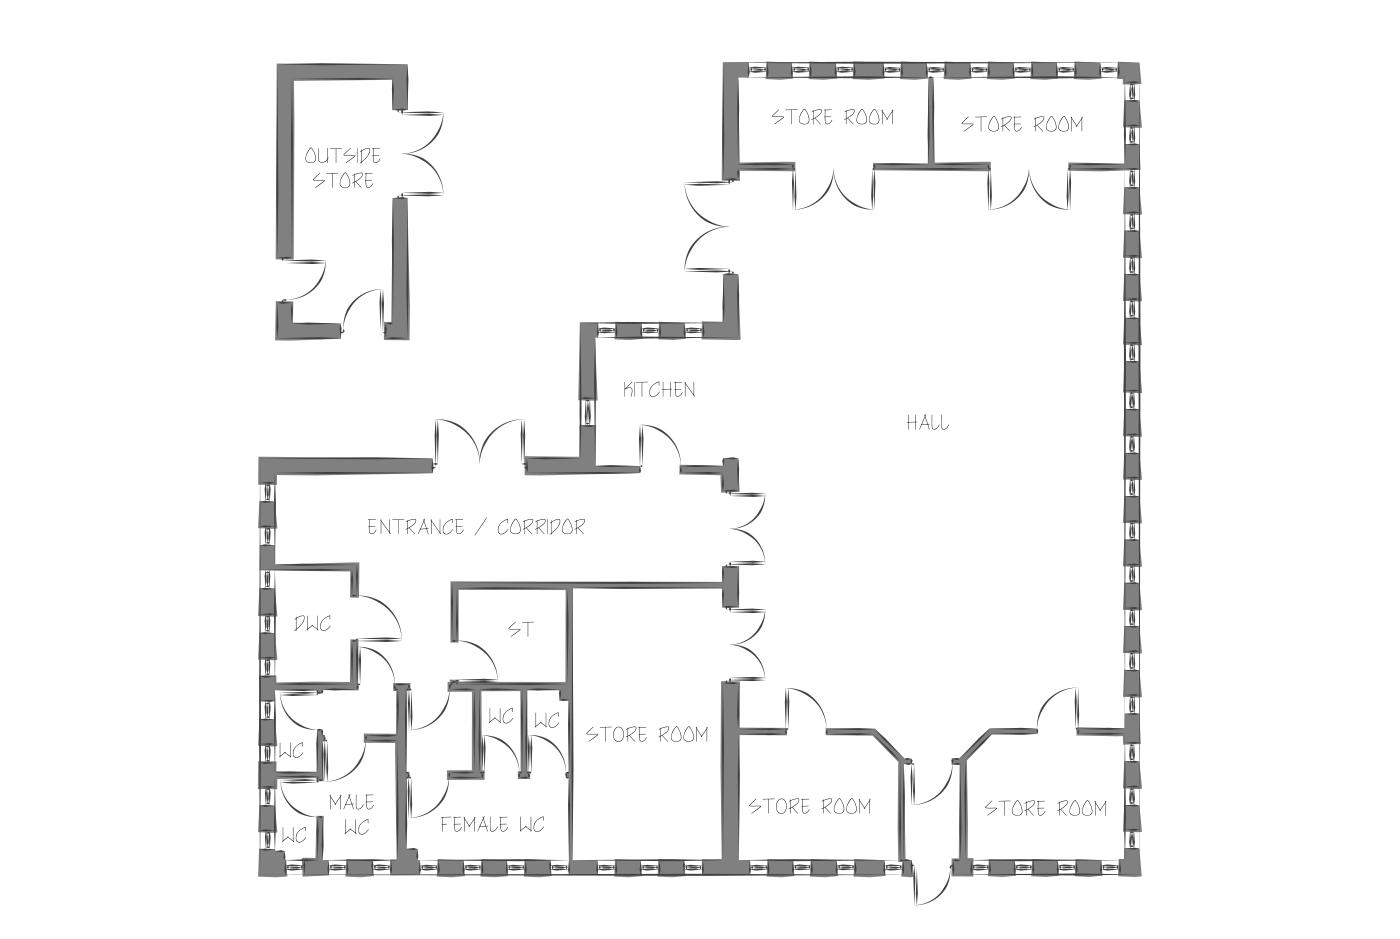 Kingsthorpe community centre floor plan